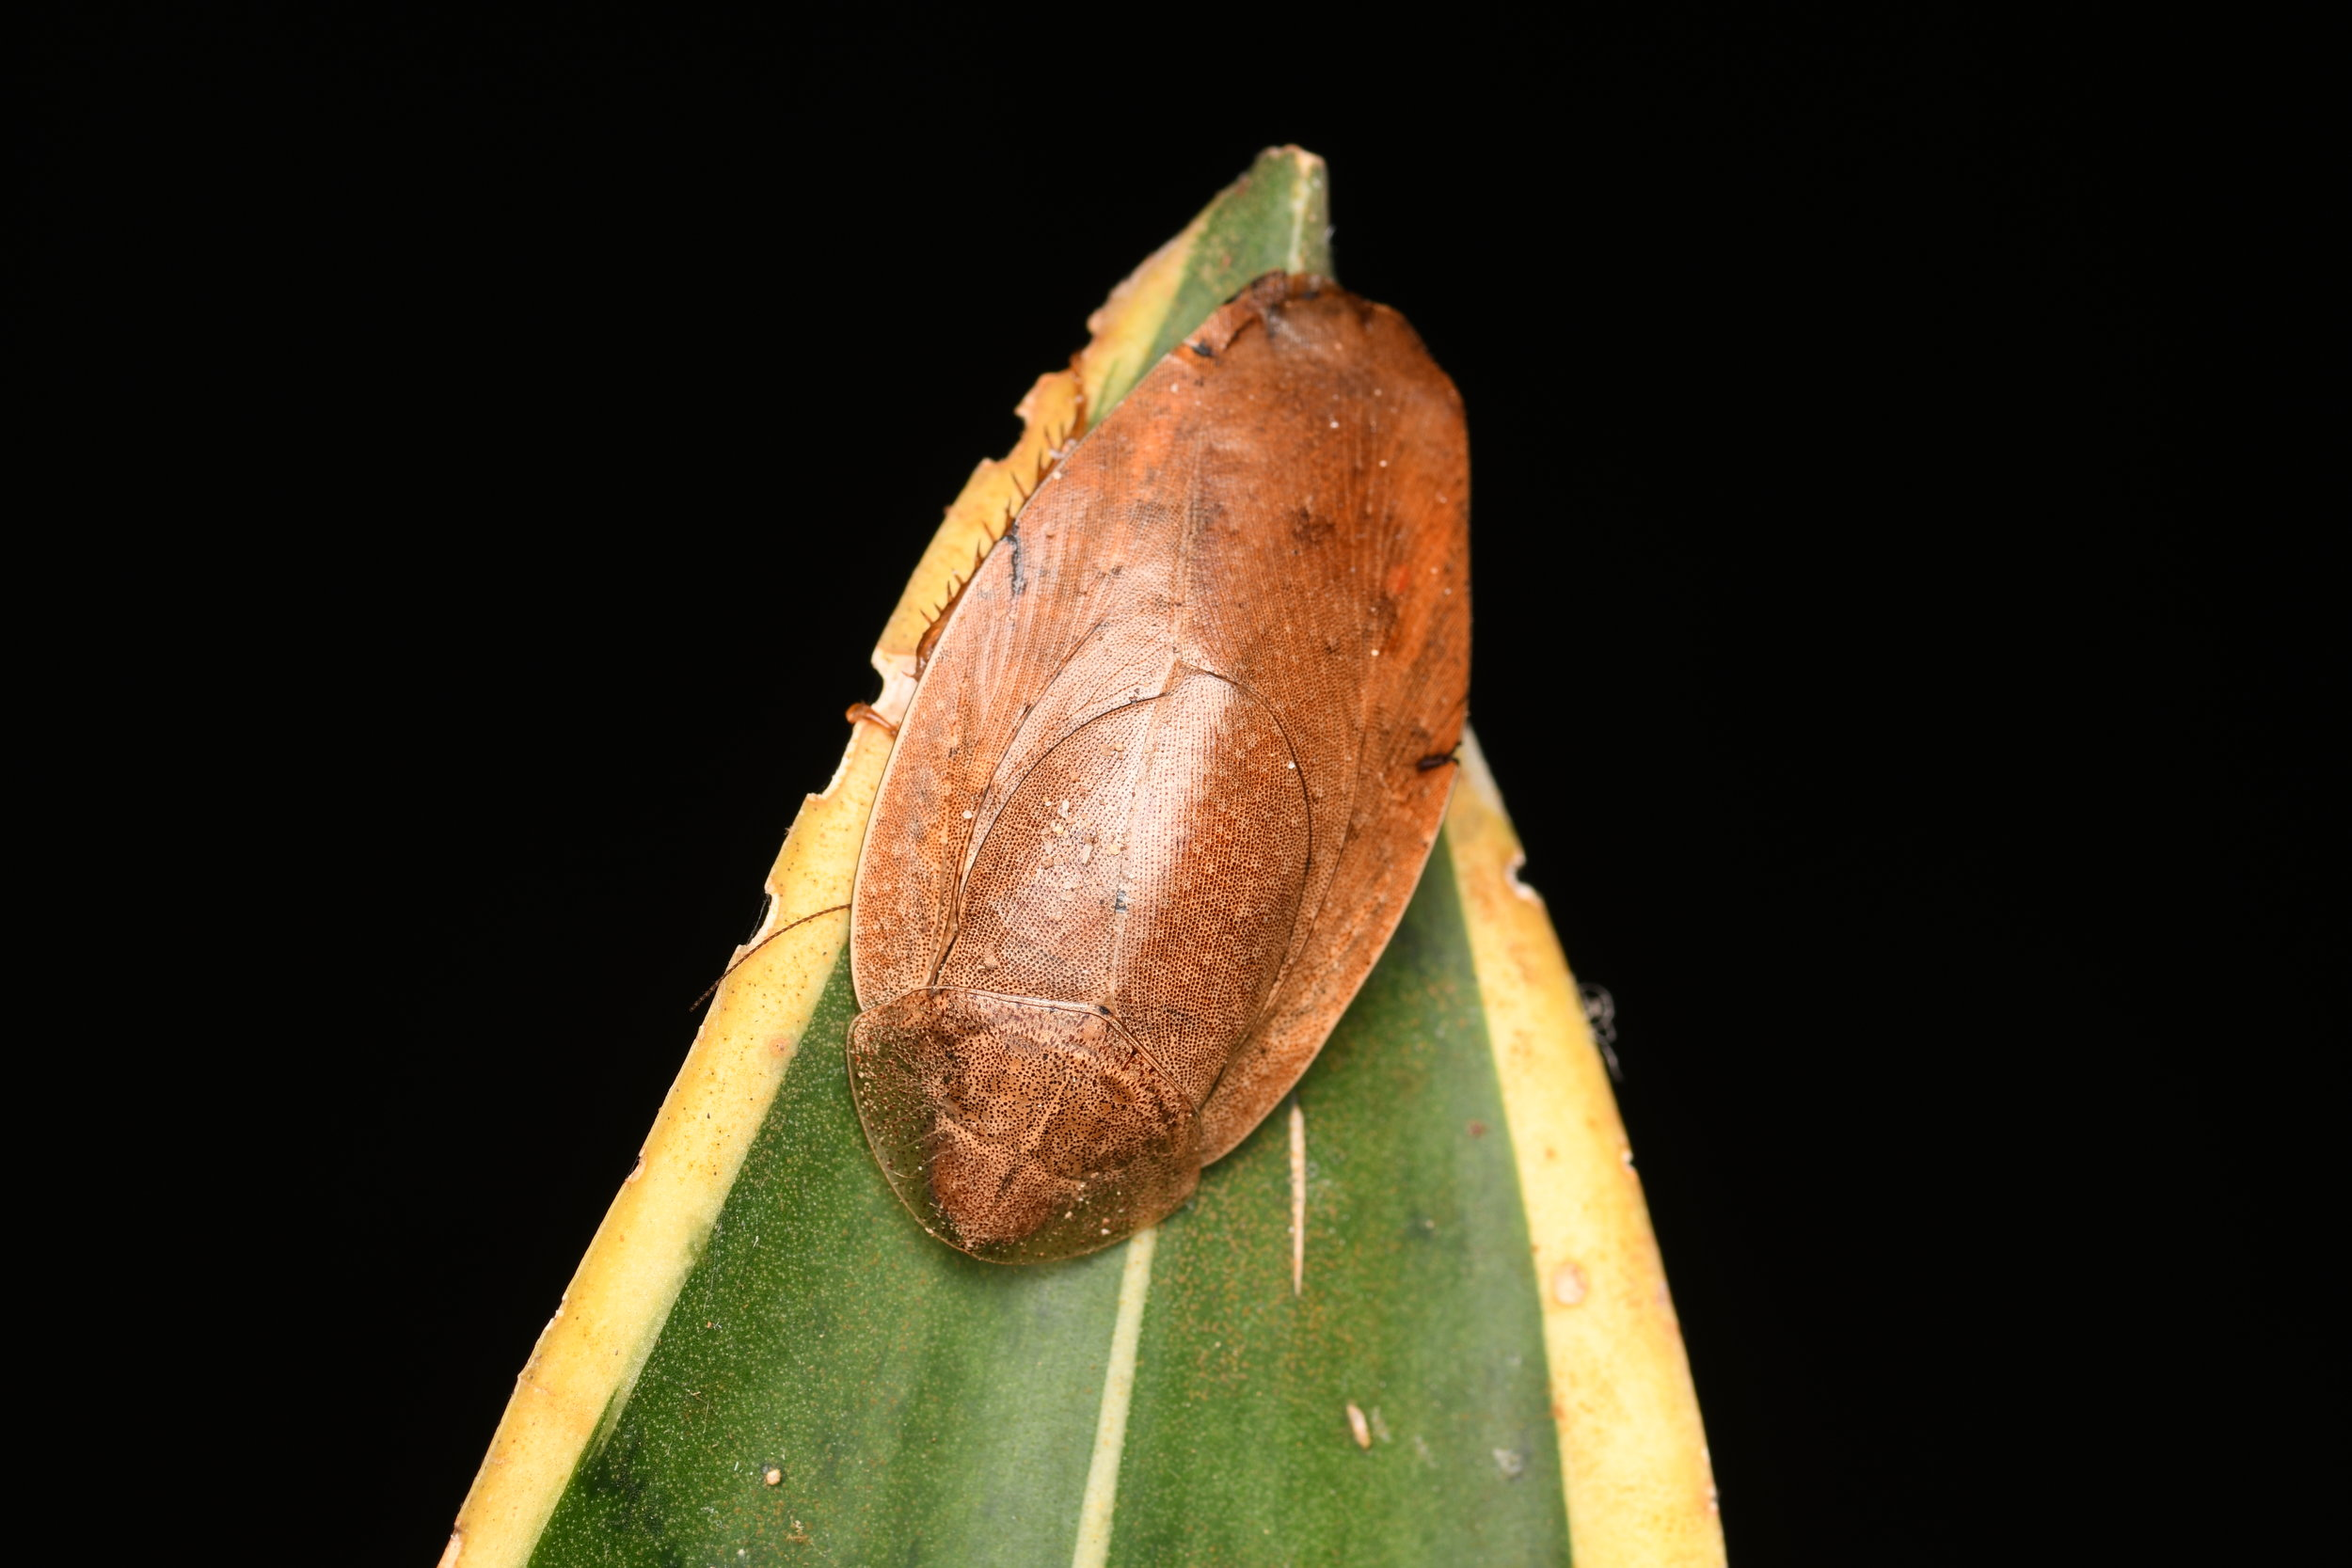 Epilamprinae roach ( Pseudophoraspis  sp.),   Telaga Tujuh, Langkawi Island, Malaysia  • Nikon D500, Tokina 100mm f/2.8 macro, Nikon SB900 @ 1/8 power with softbox, ISO100, f/18, 1/120s